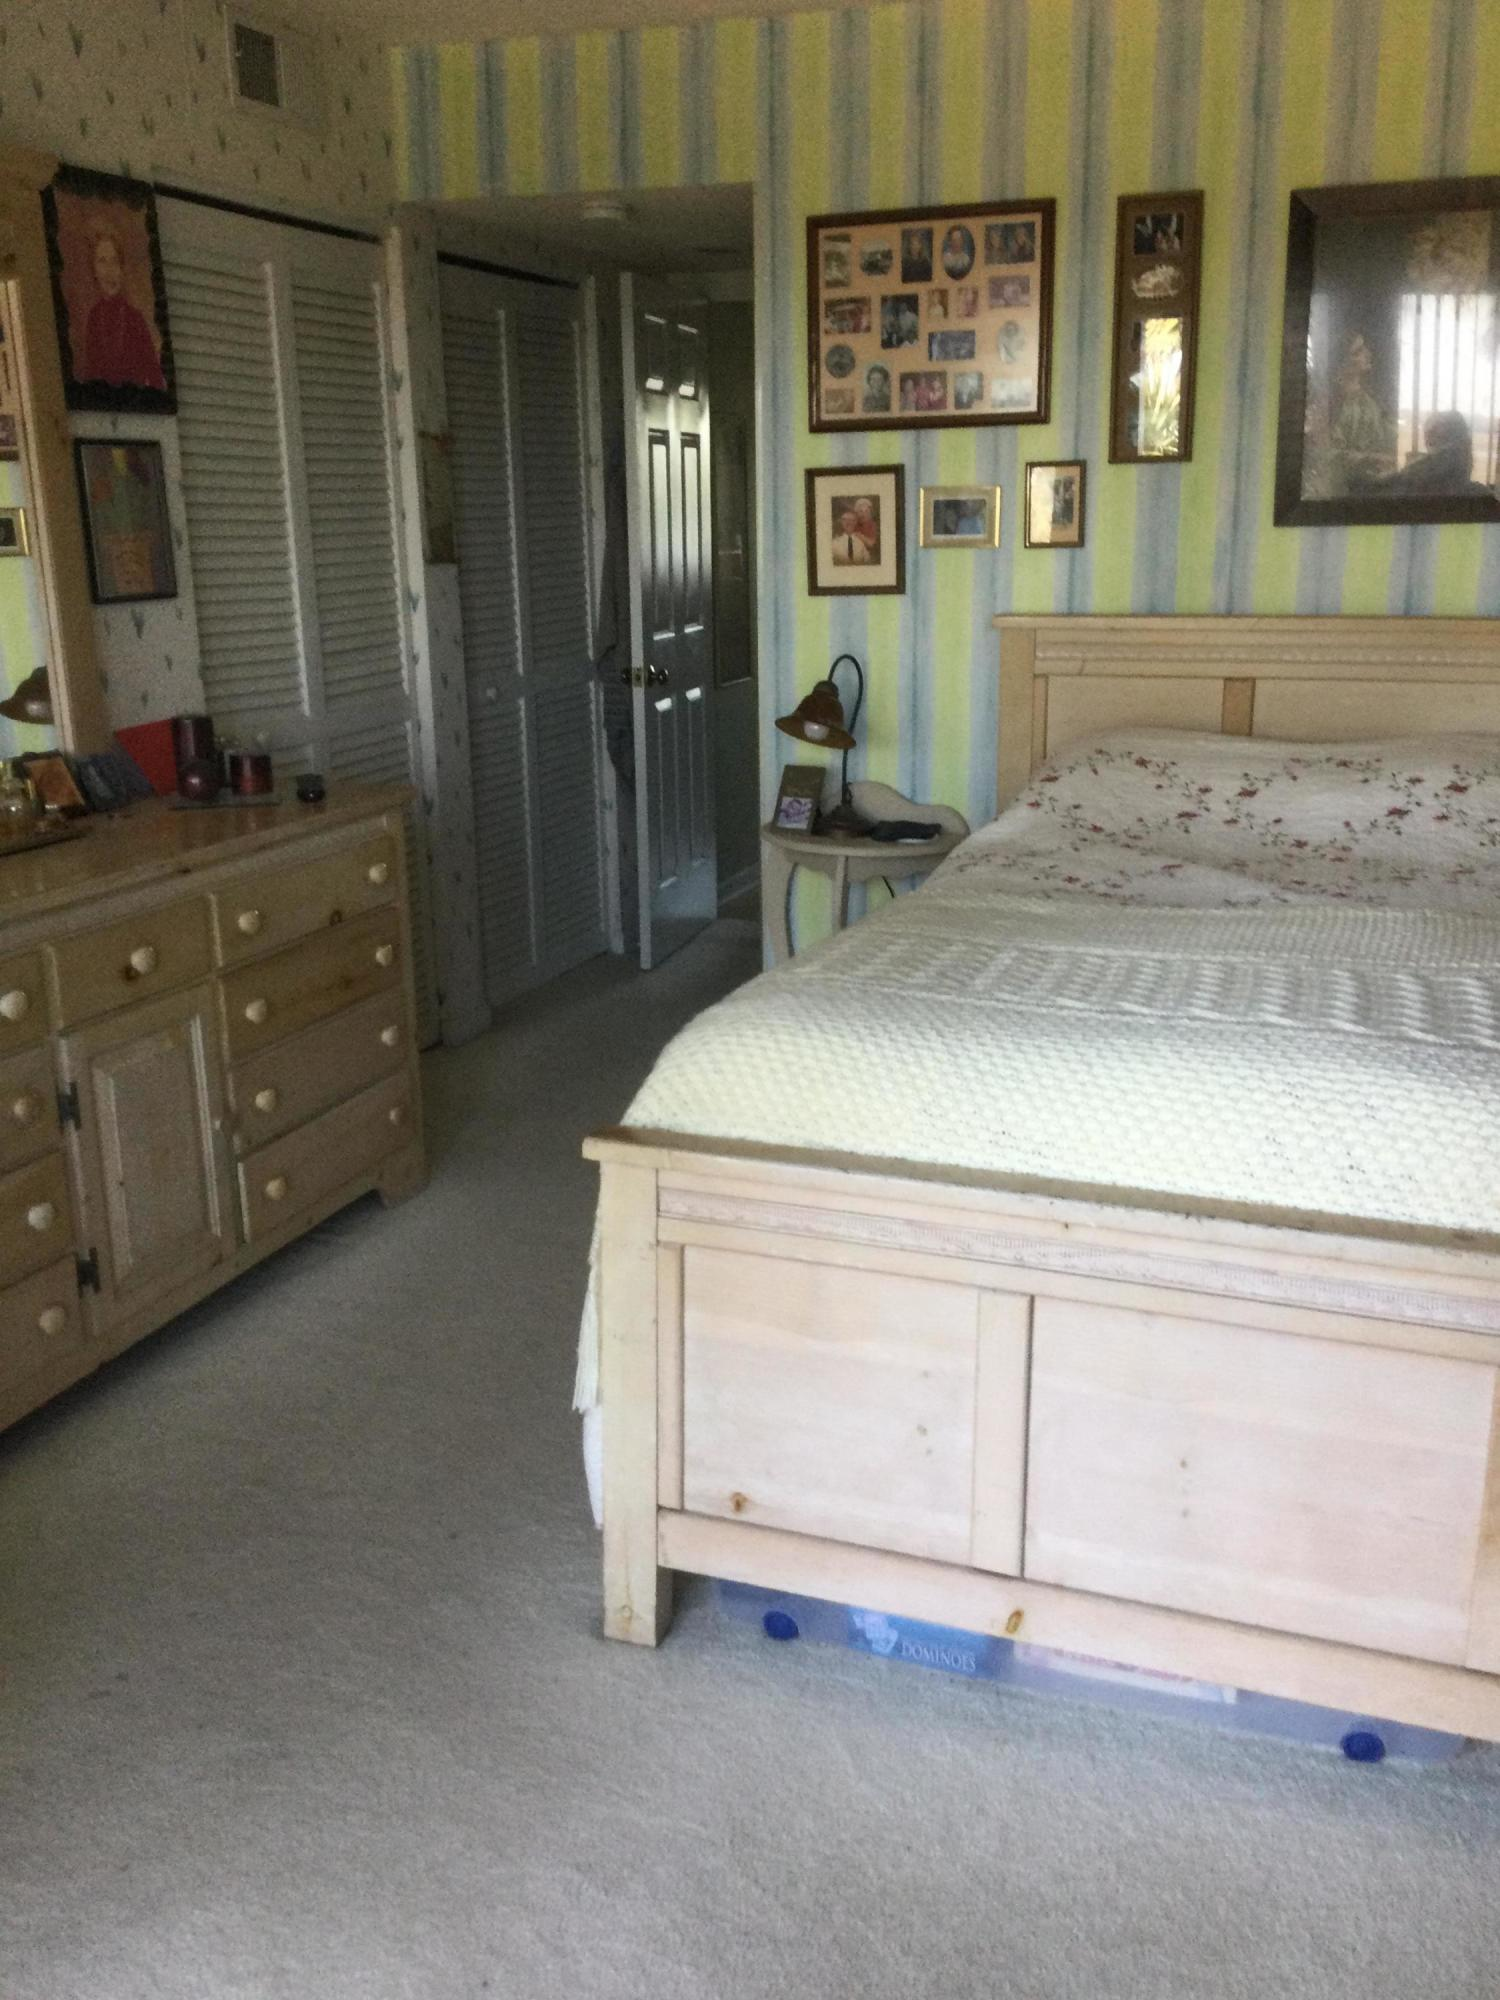 Marshview Villas Homes For Sale - 124 Mariners Cay, Folly Beach, SC - 8